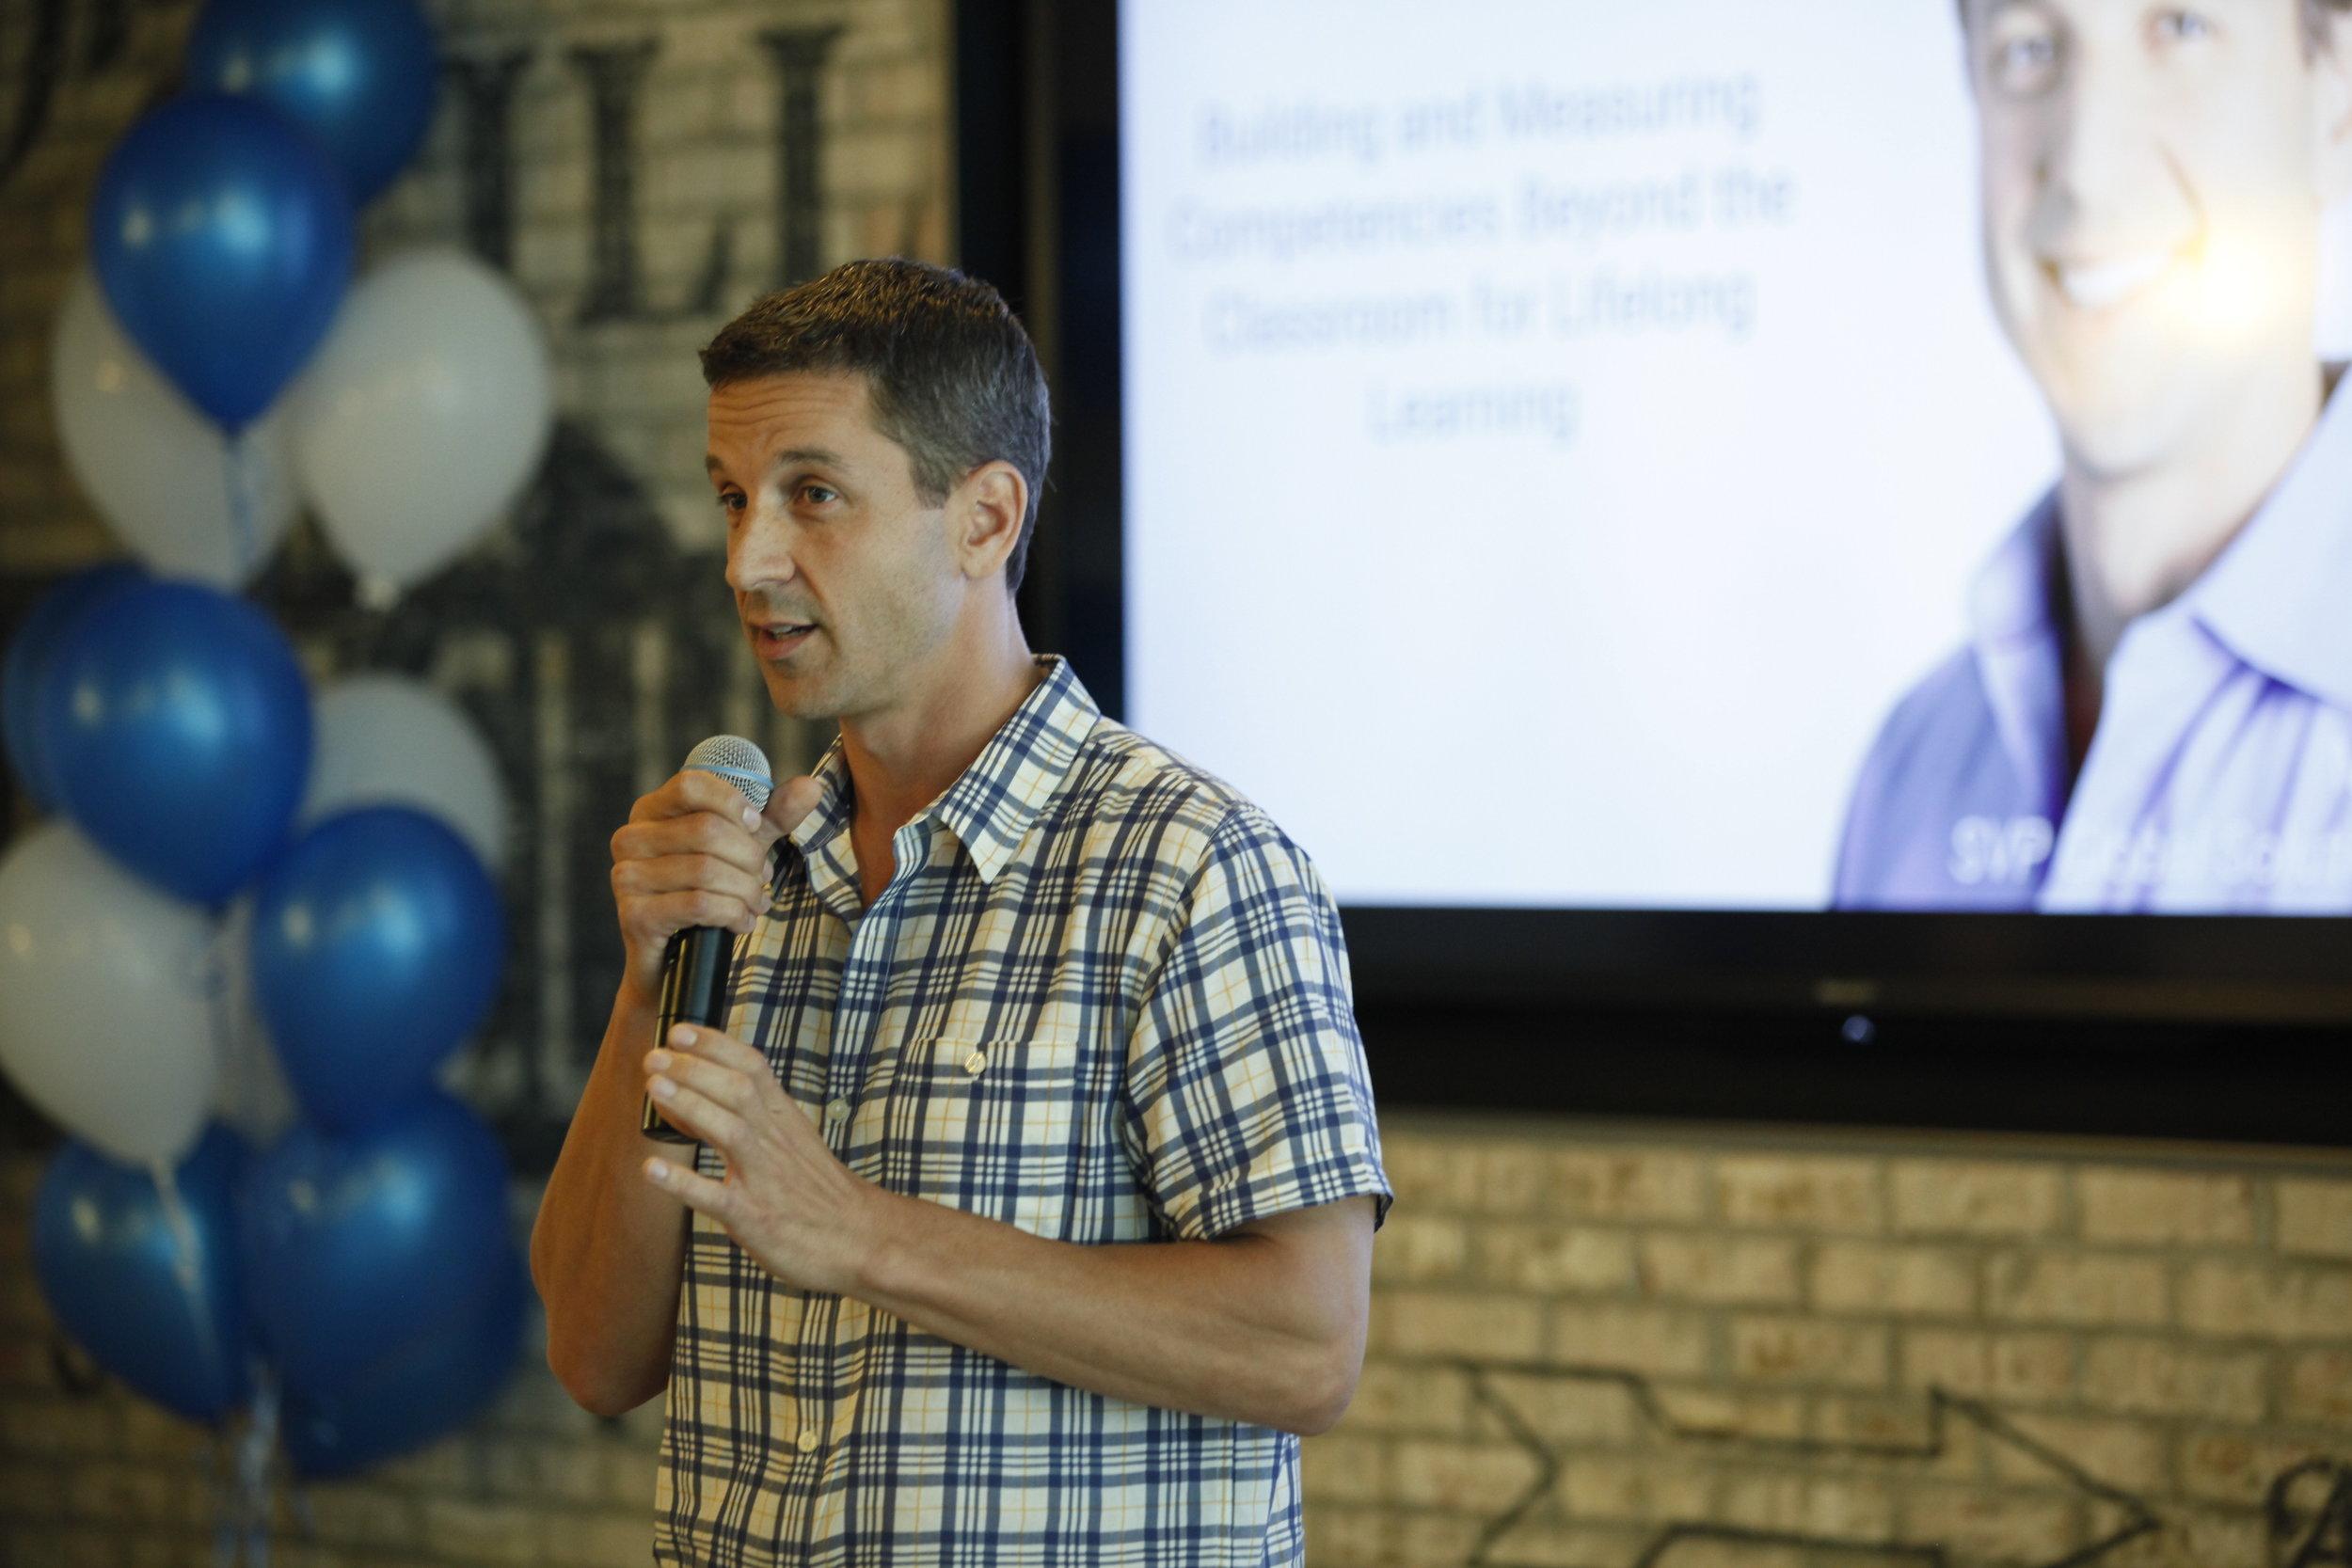 Mike Gamson, SVP of Global Solutions, LinkedIn